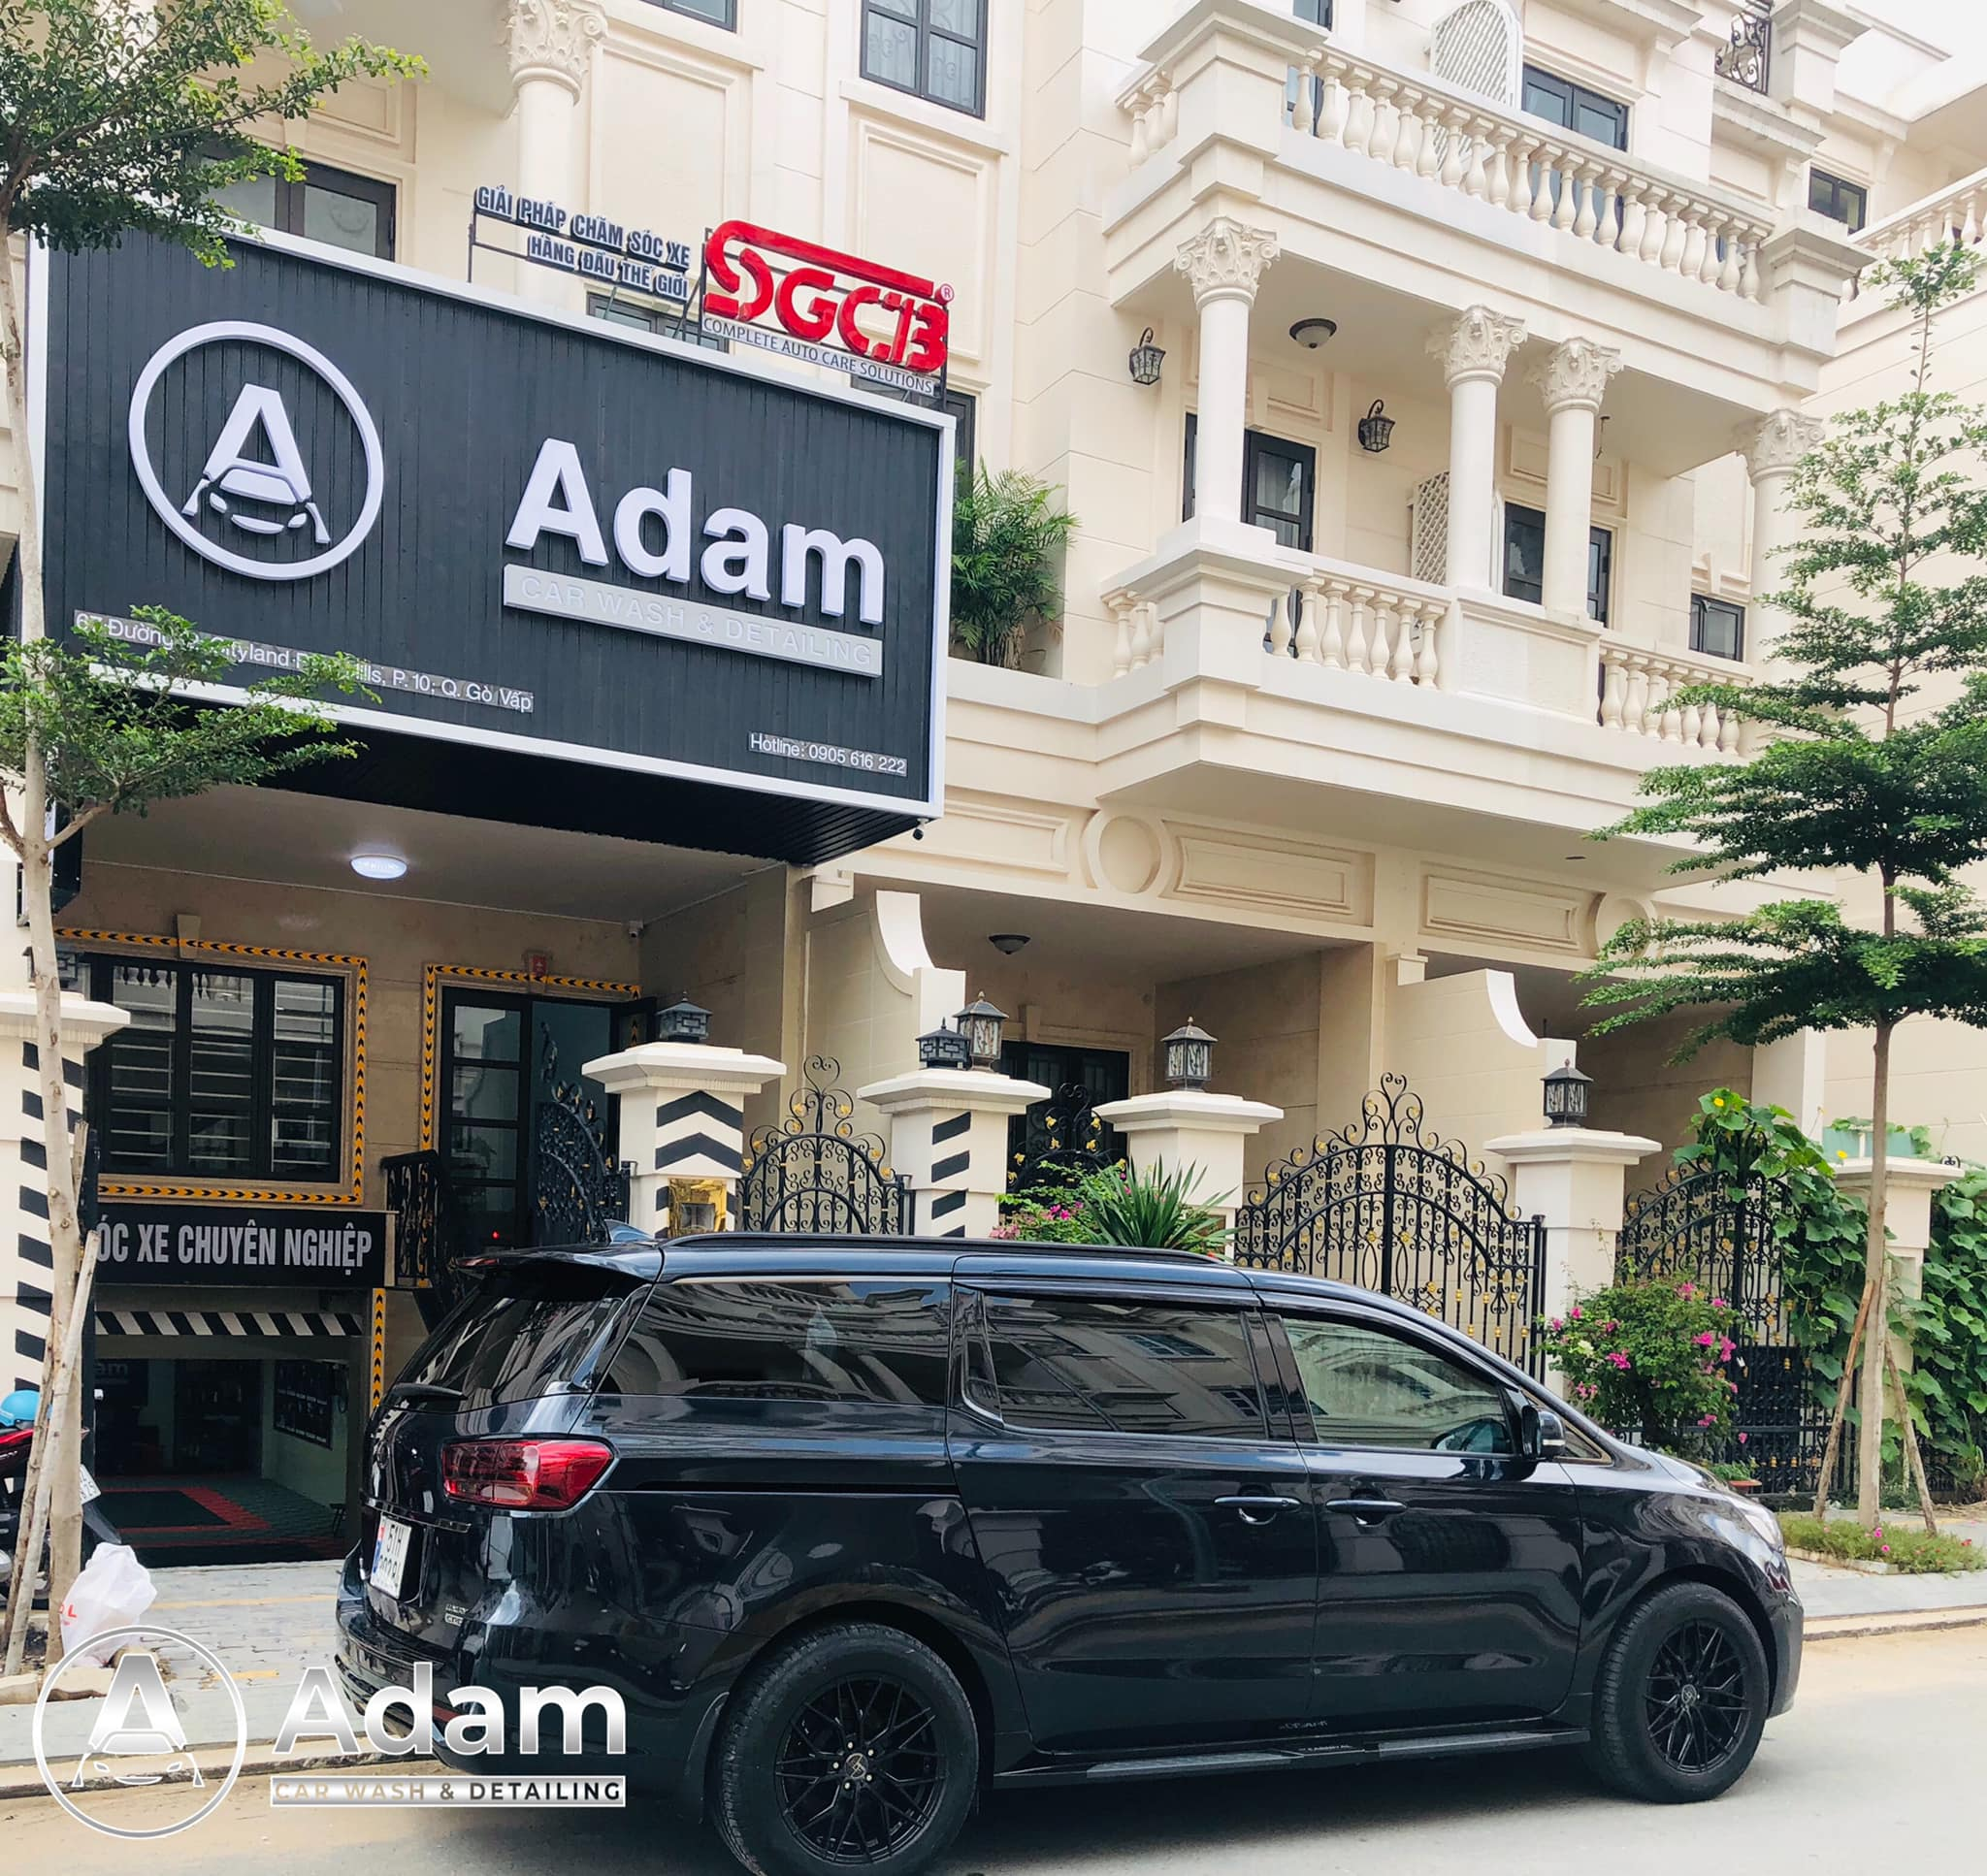 adam-car-wash-detailing-dai-ly-sgcb-khu-vuc-go-vap-7